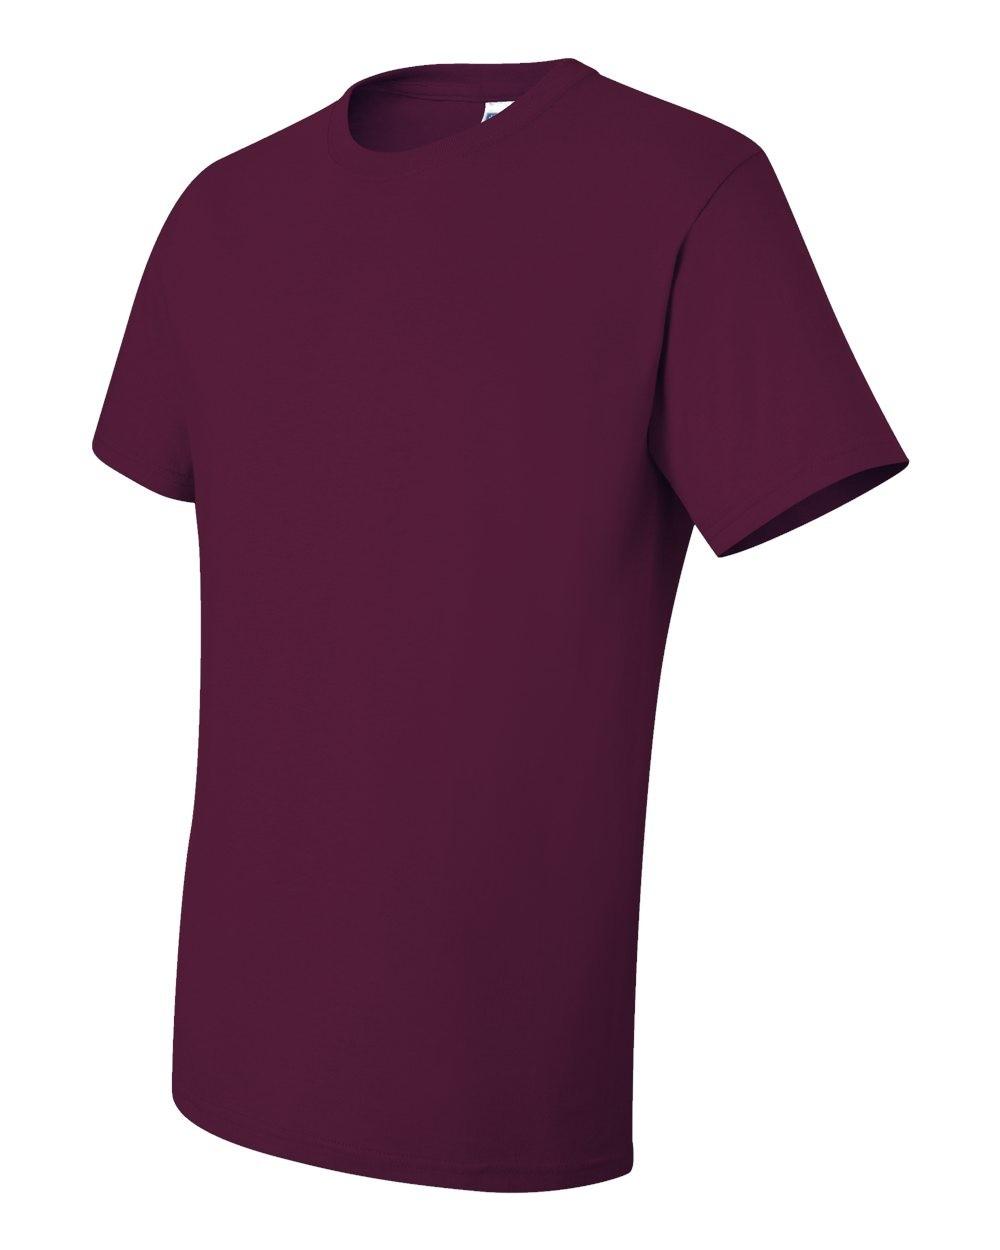 SBS Gym T-Shirt w/ Logo